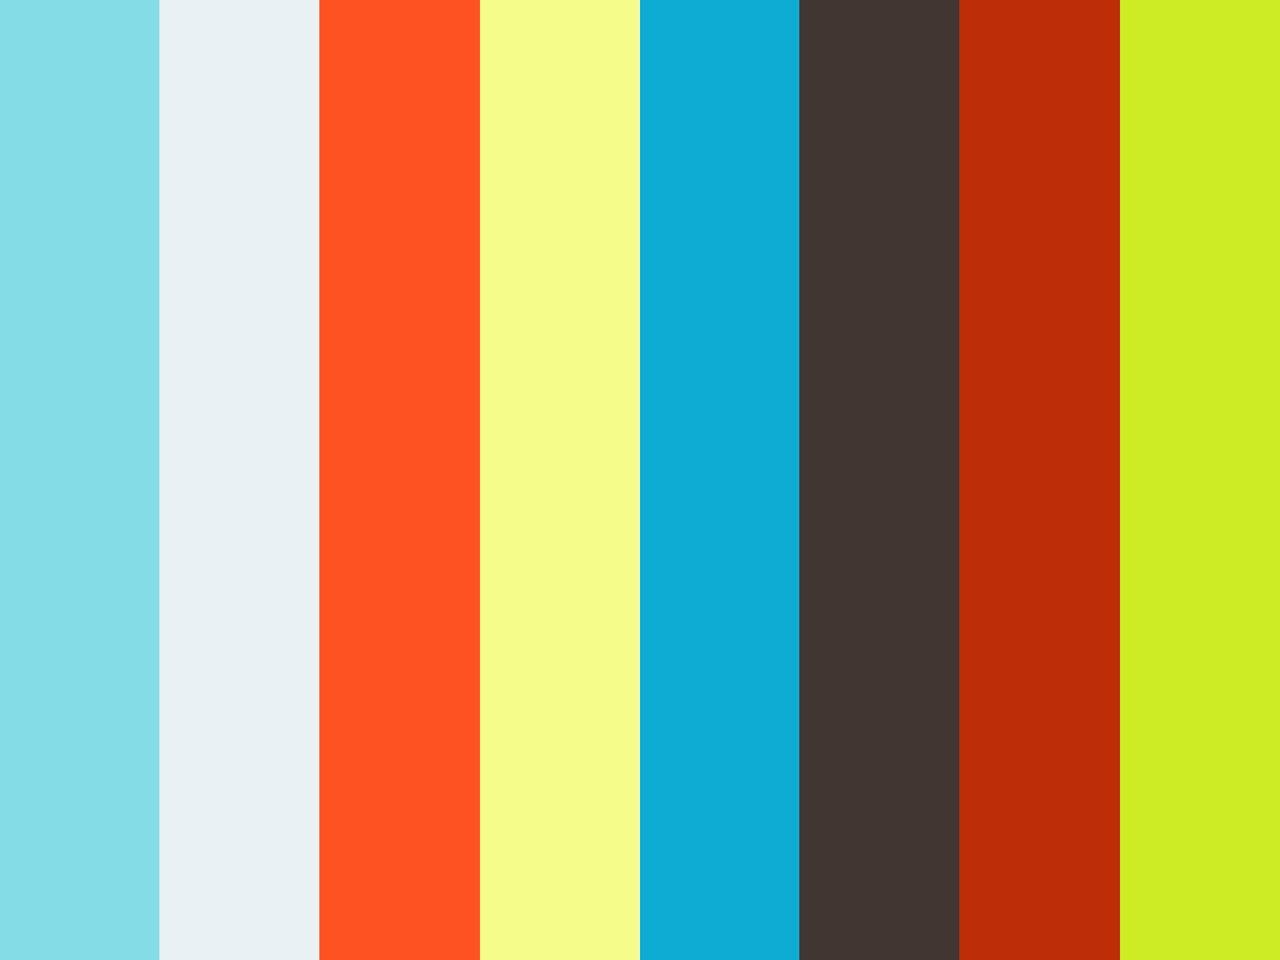 003048 - SNTV - Wandelbrochure Trage Wegen